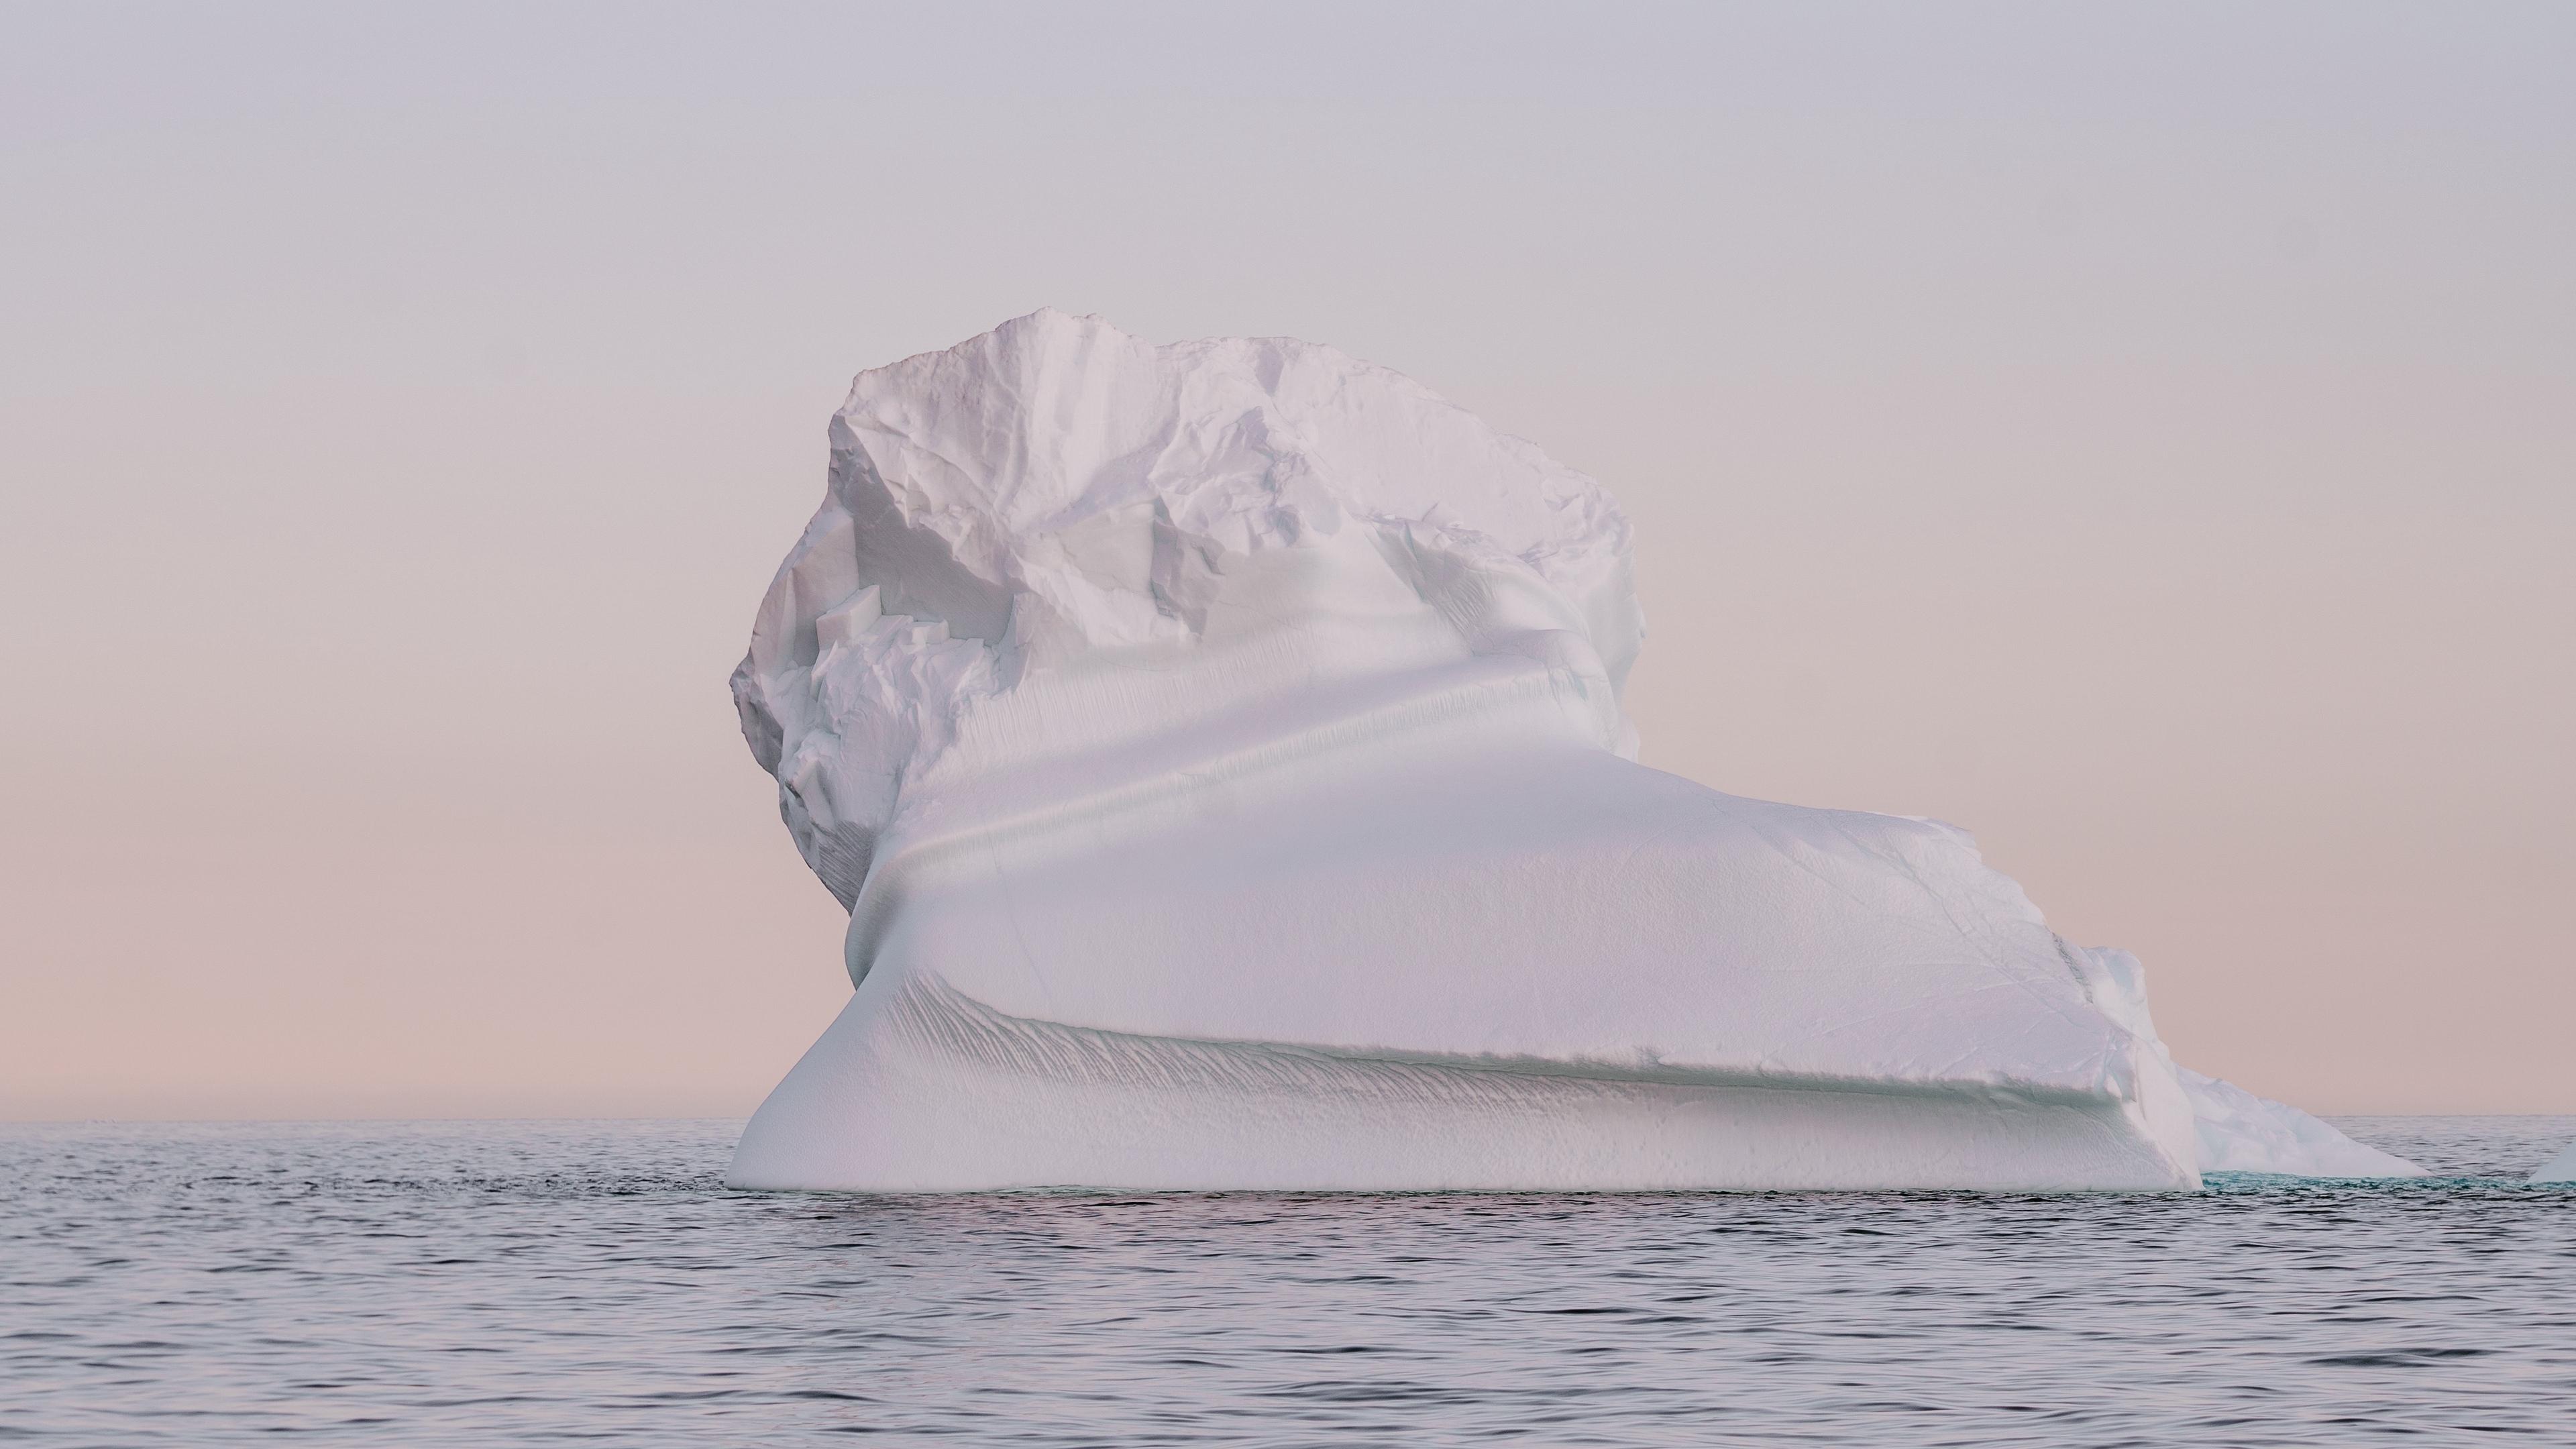 iceberg snow arctic twilight 4k 1541117266 - iceberg, snow, arctic, twilight 4k - Snow, Iceberg, Arctic